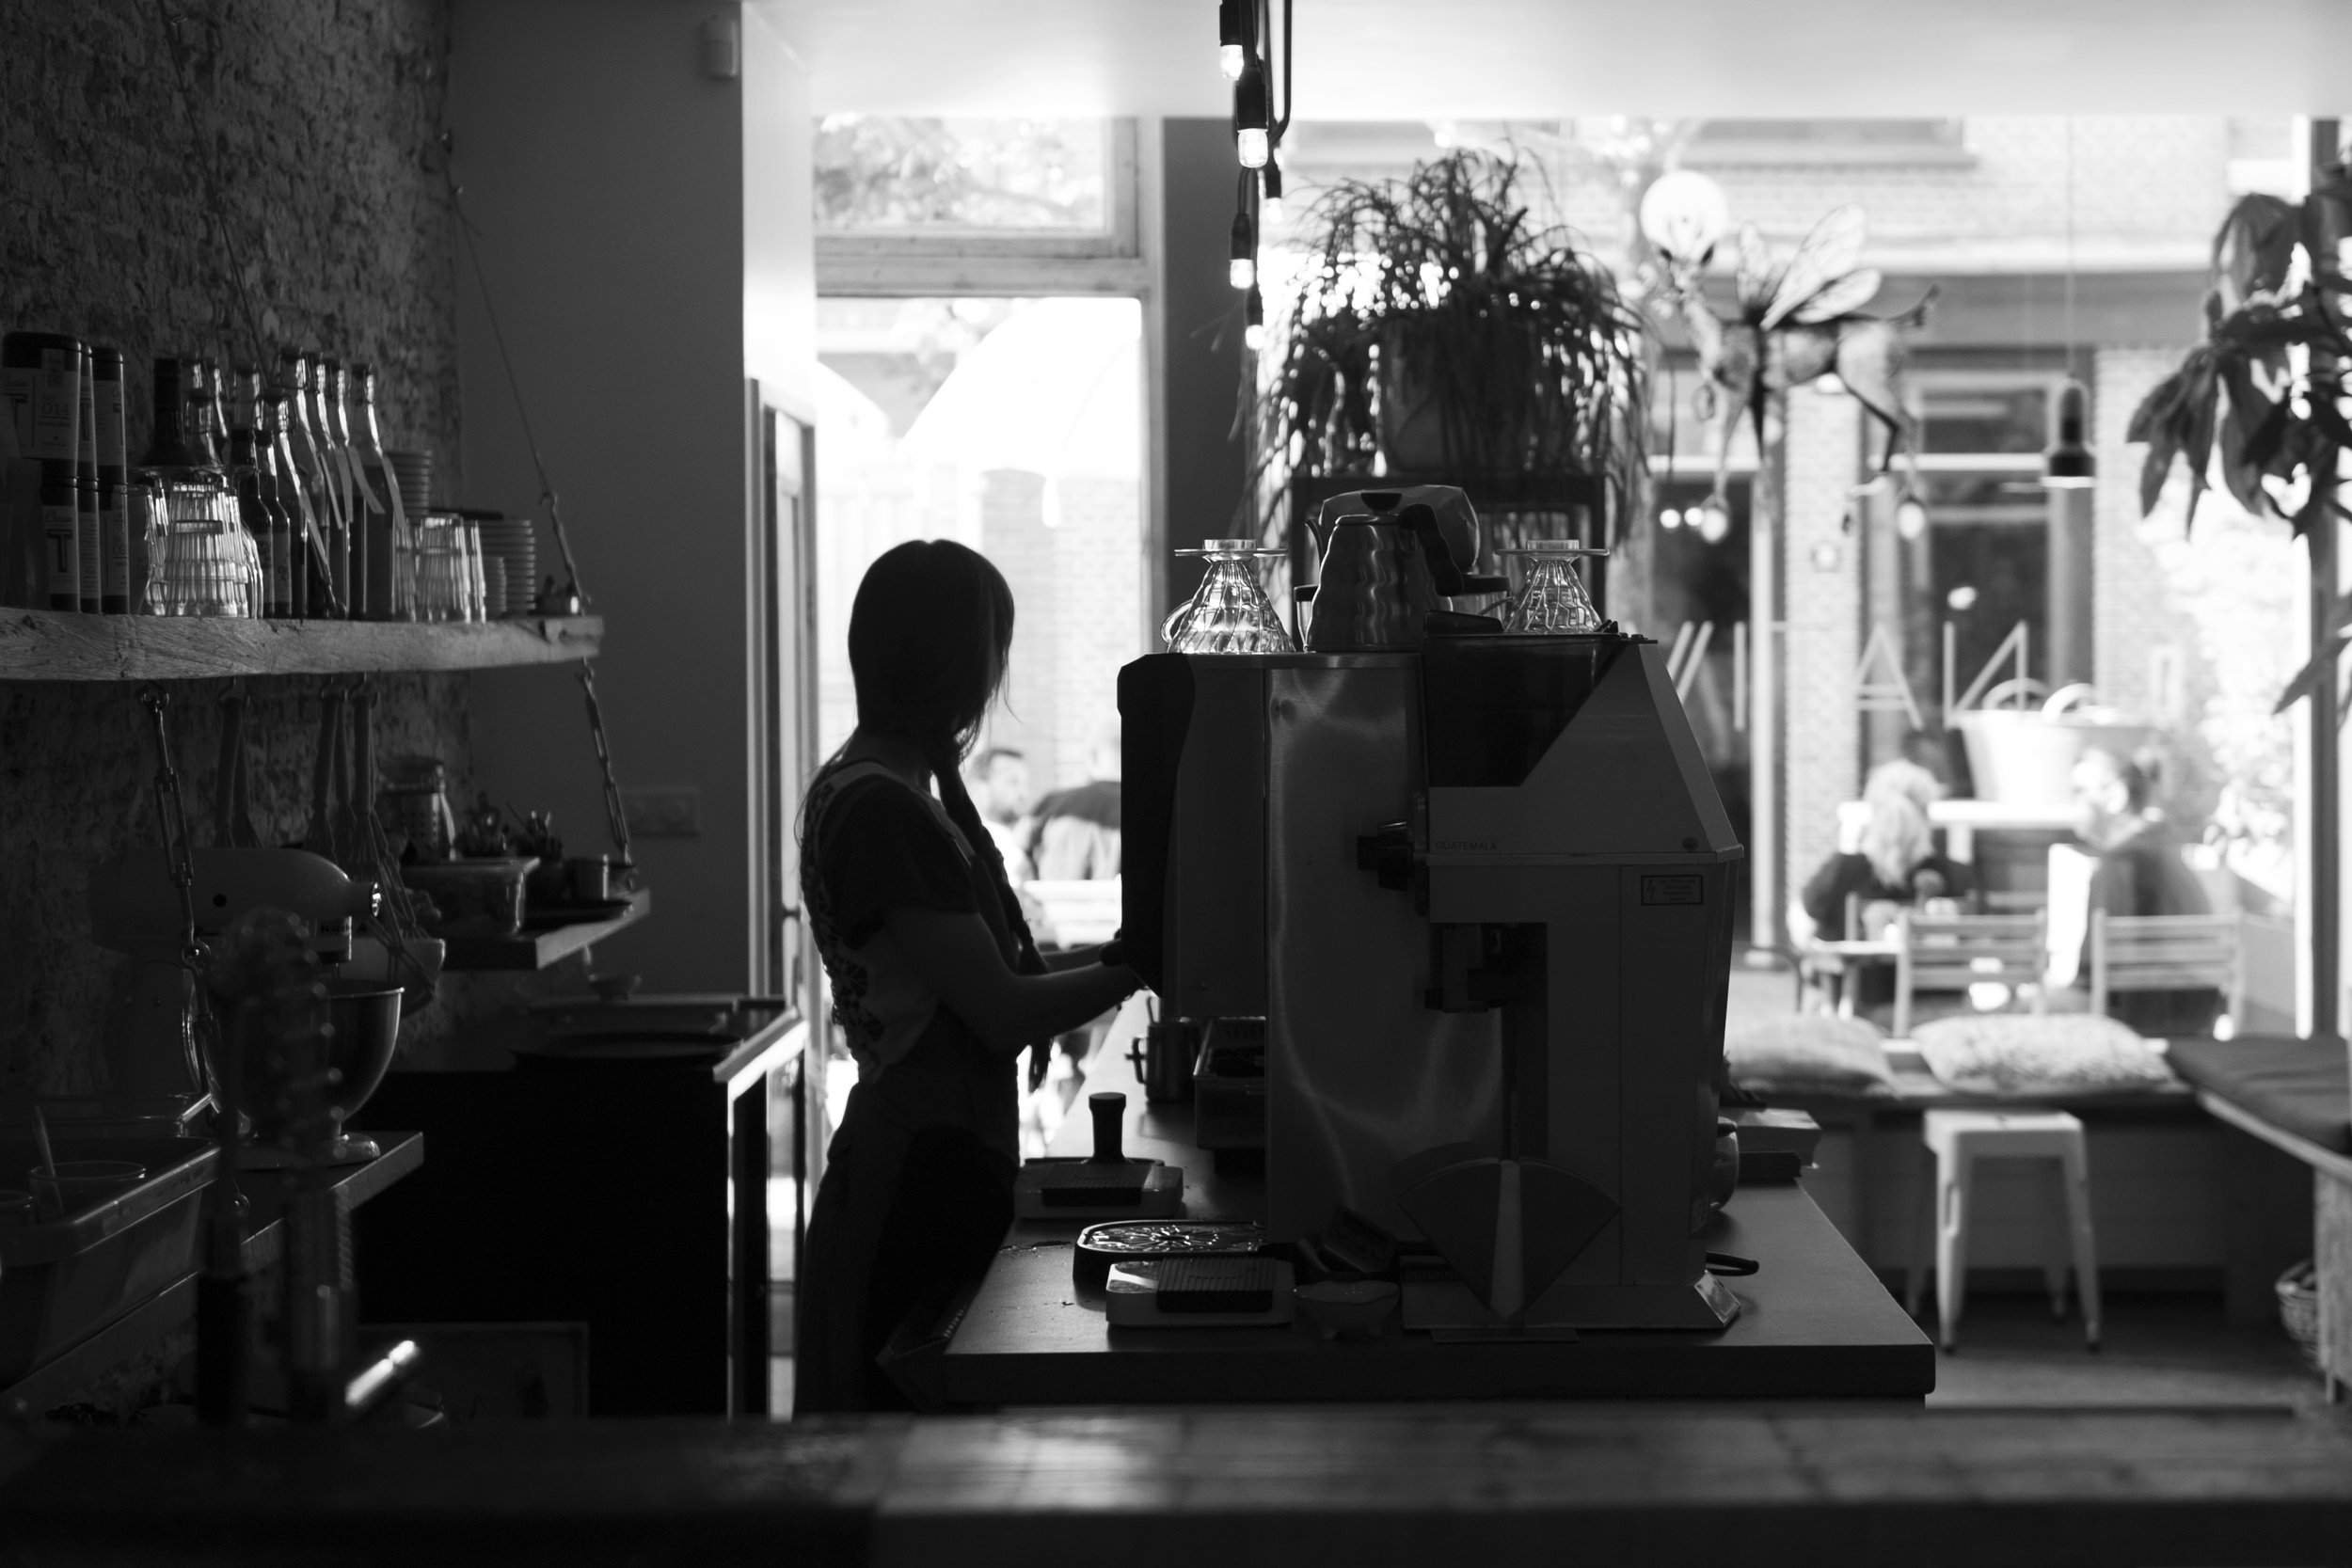 koffie hotspots in Haarlem